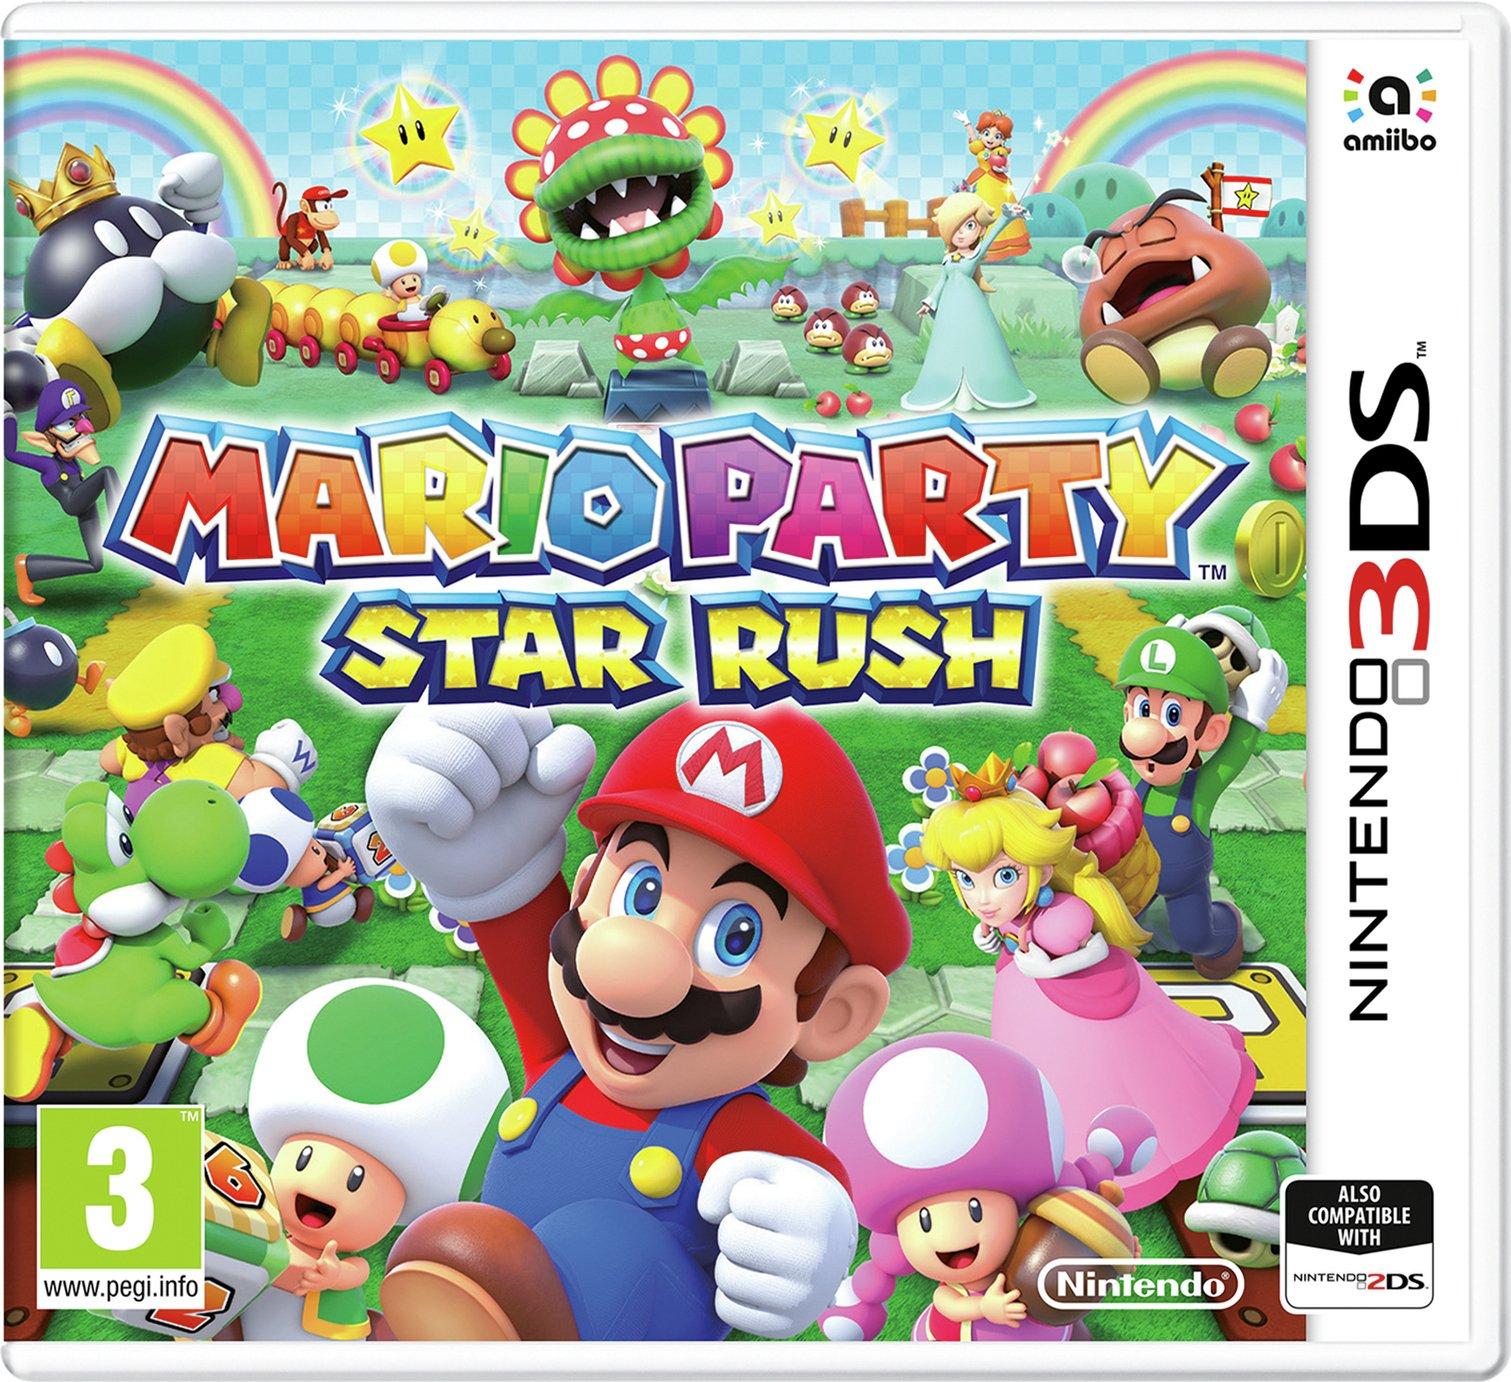 Mario Party: Star Rush Nintendo 3DS Game - £7.99 @ Argos